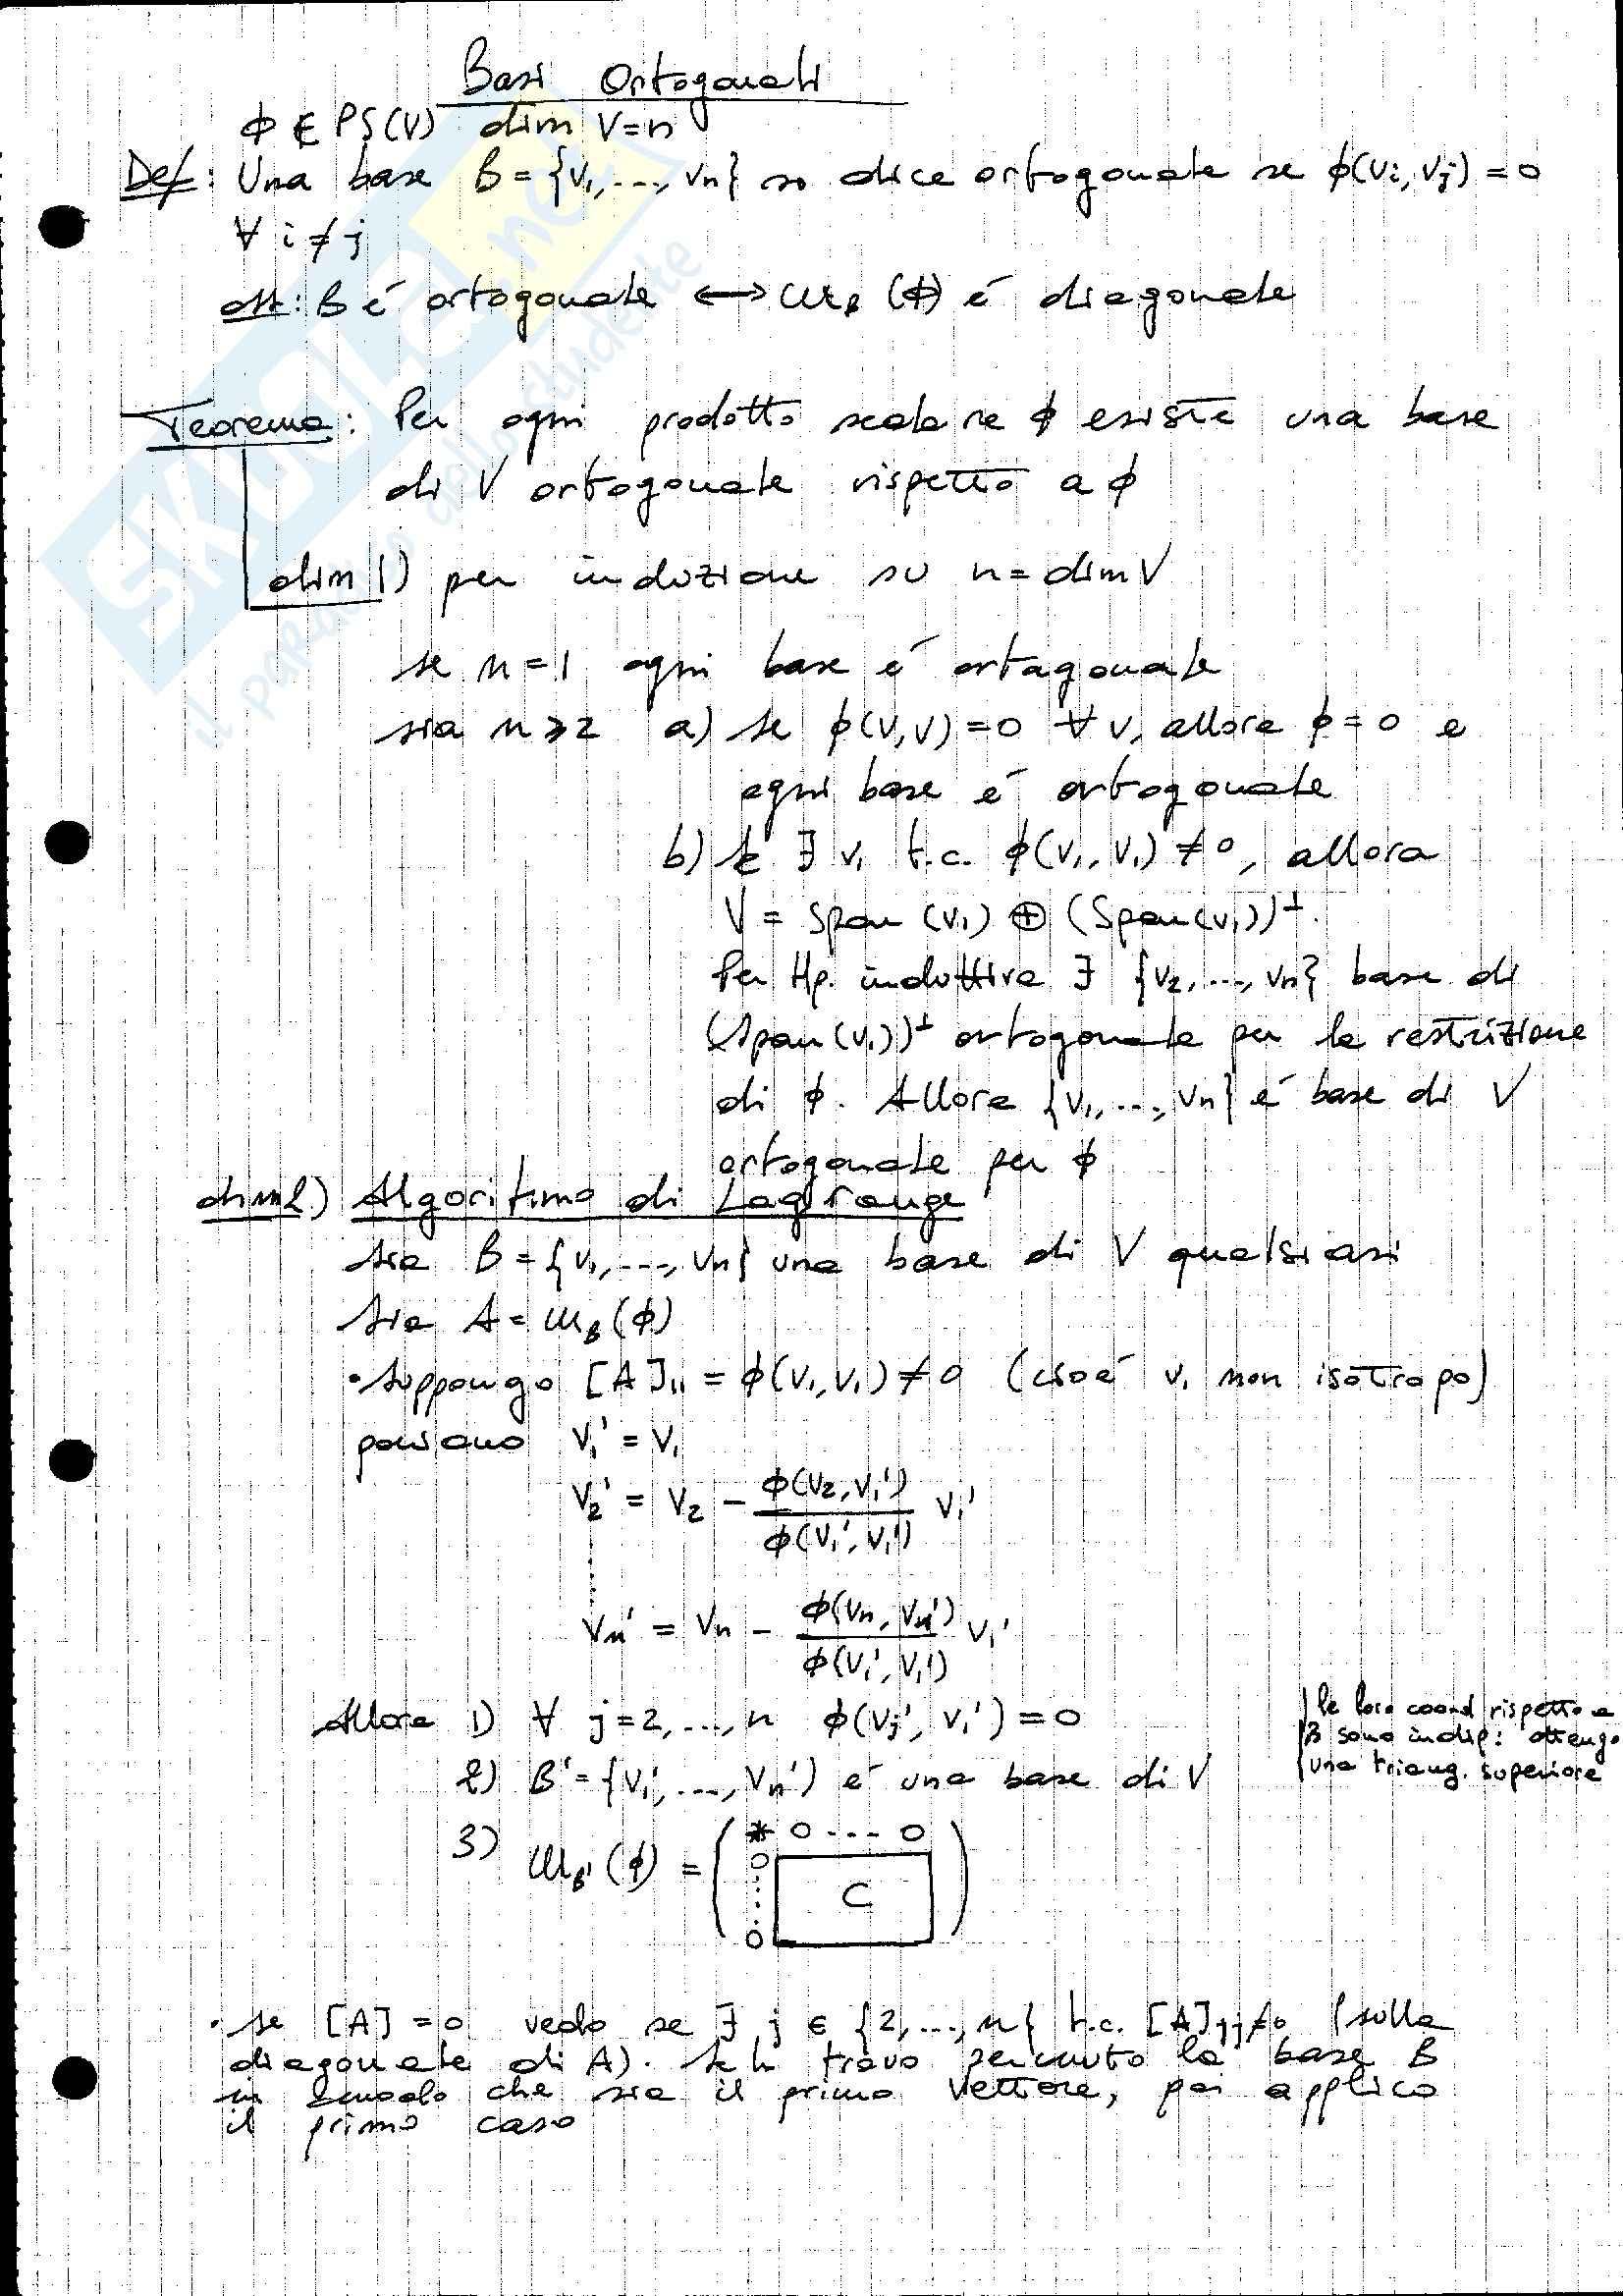 Parte 2, Geometria analitica e algebra lineare Pag. 16